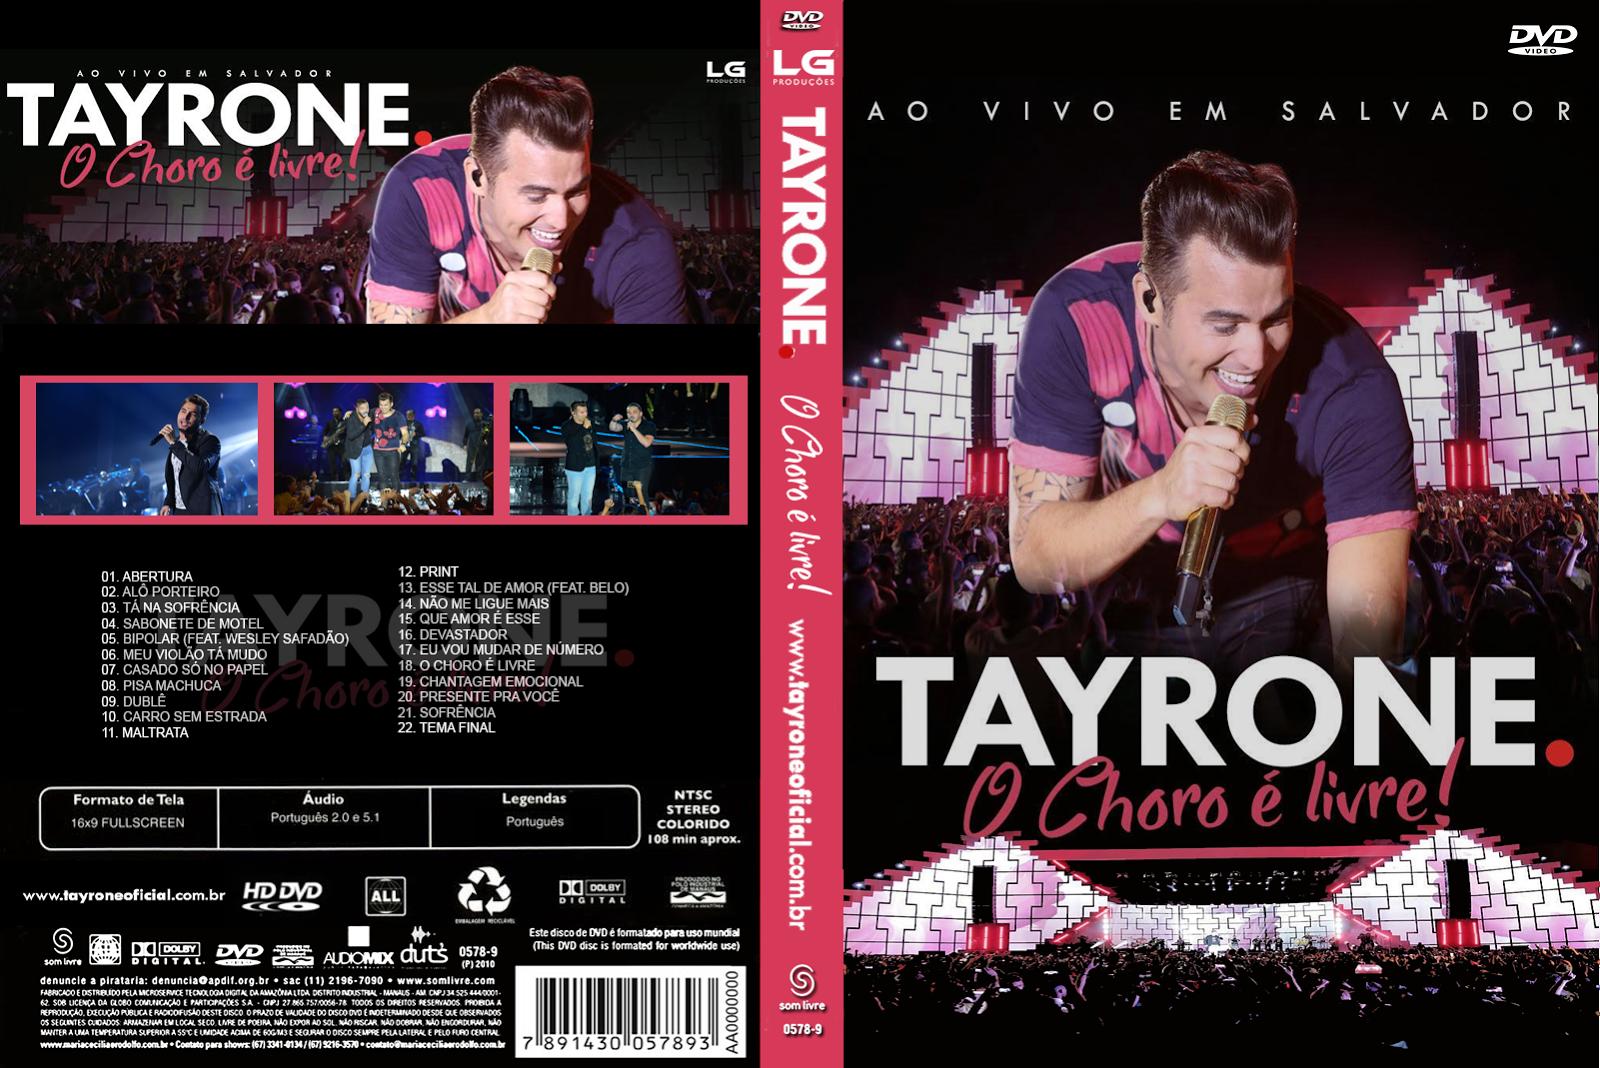 Tayrone O Choro É Livre DVDRip + DVD-R Tayrone 2BO 2BChoro 2B 25C3 2589 2BLivre 2B  2BXANDAO 2BDOWNLOAD